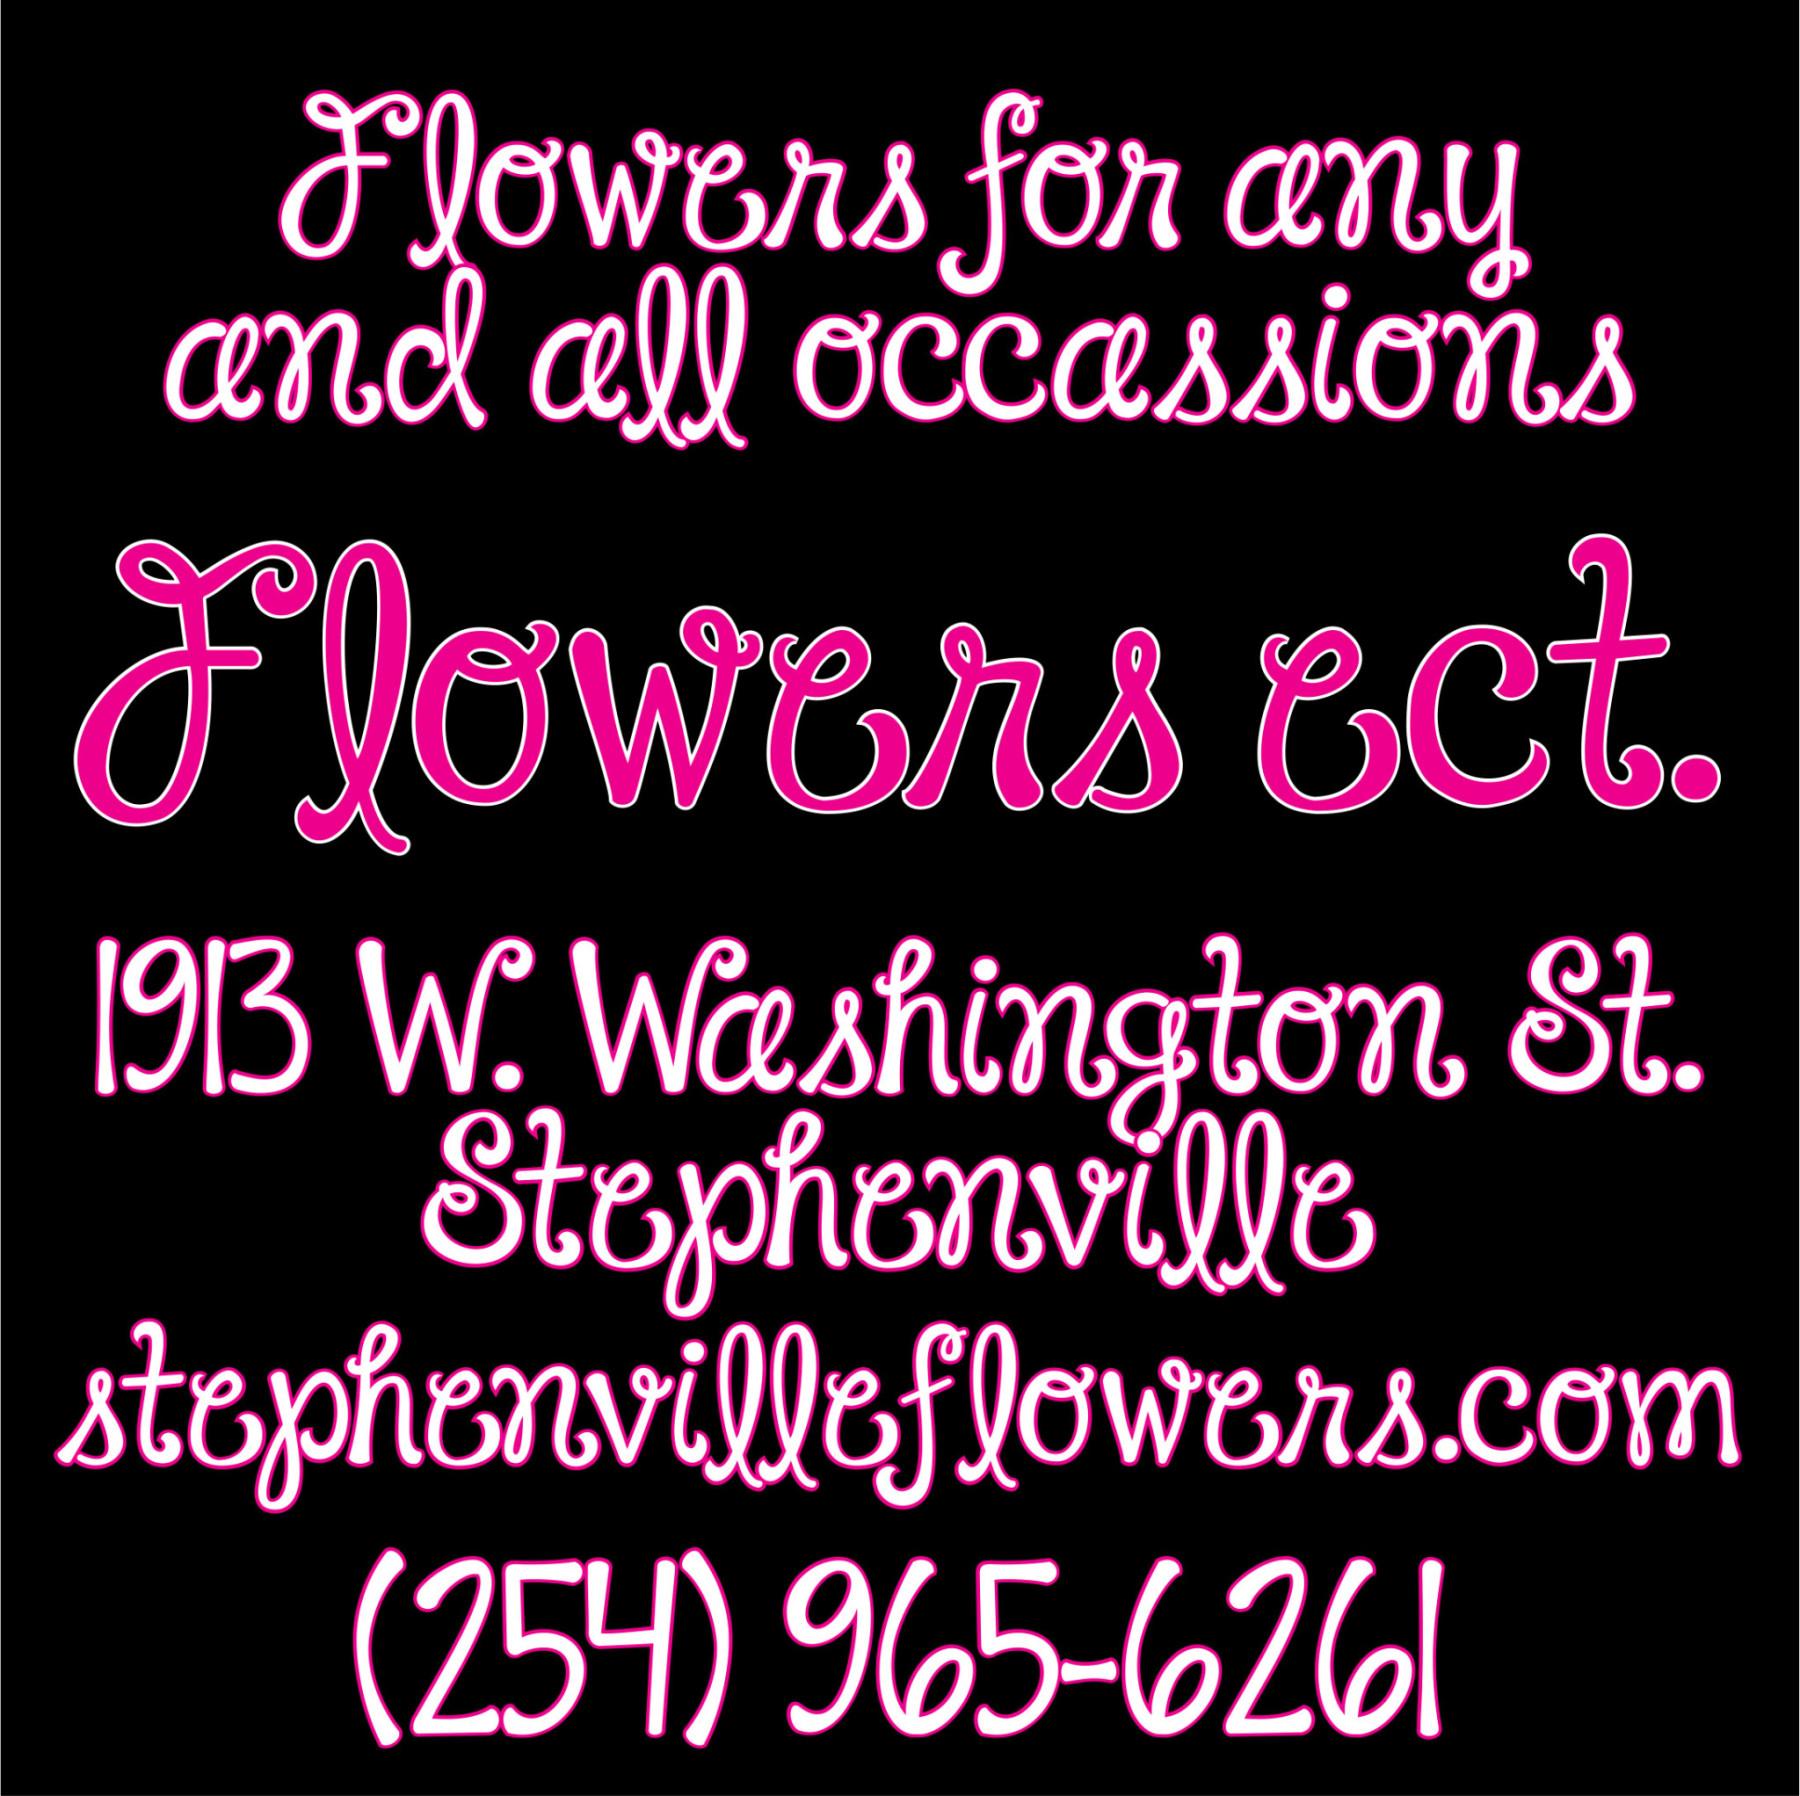 Flowers ect